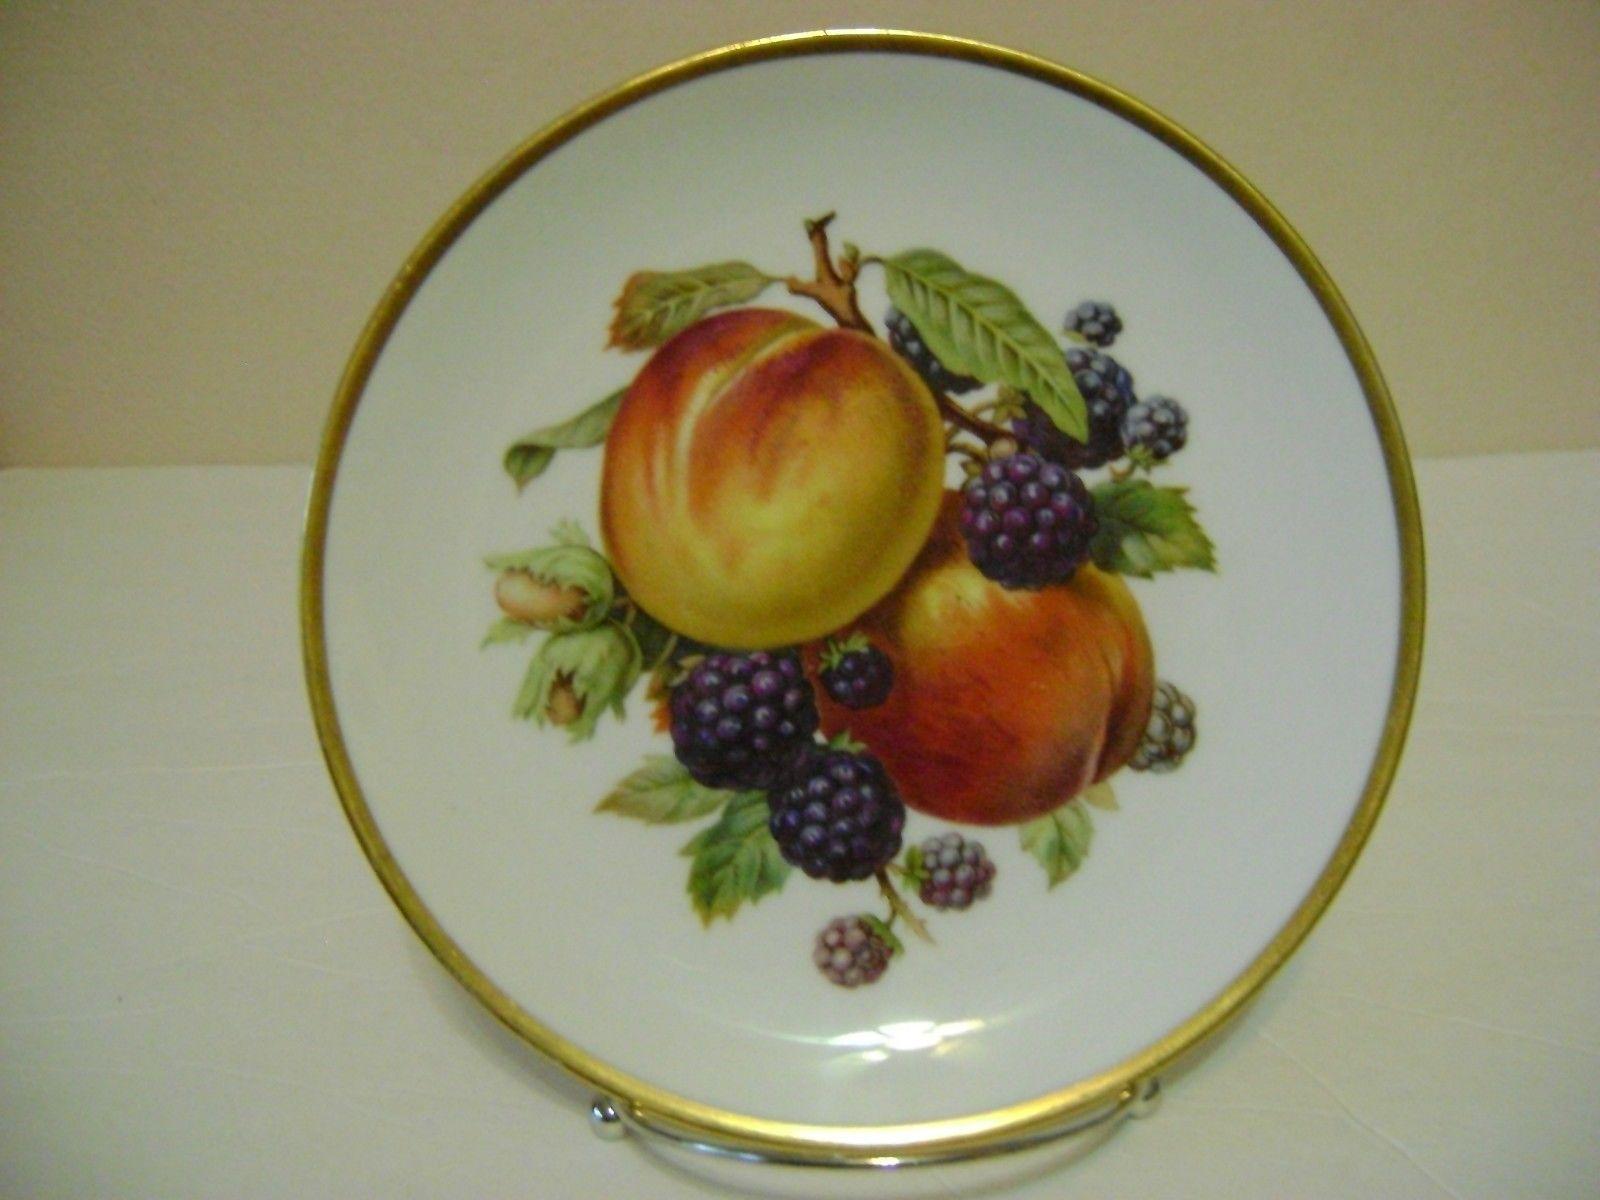 Mitterteich Bavaria Germany Fruit Plates Gold Trim